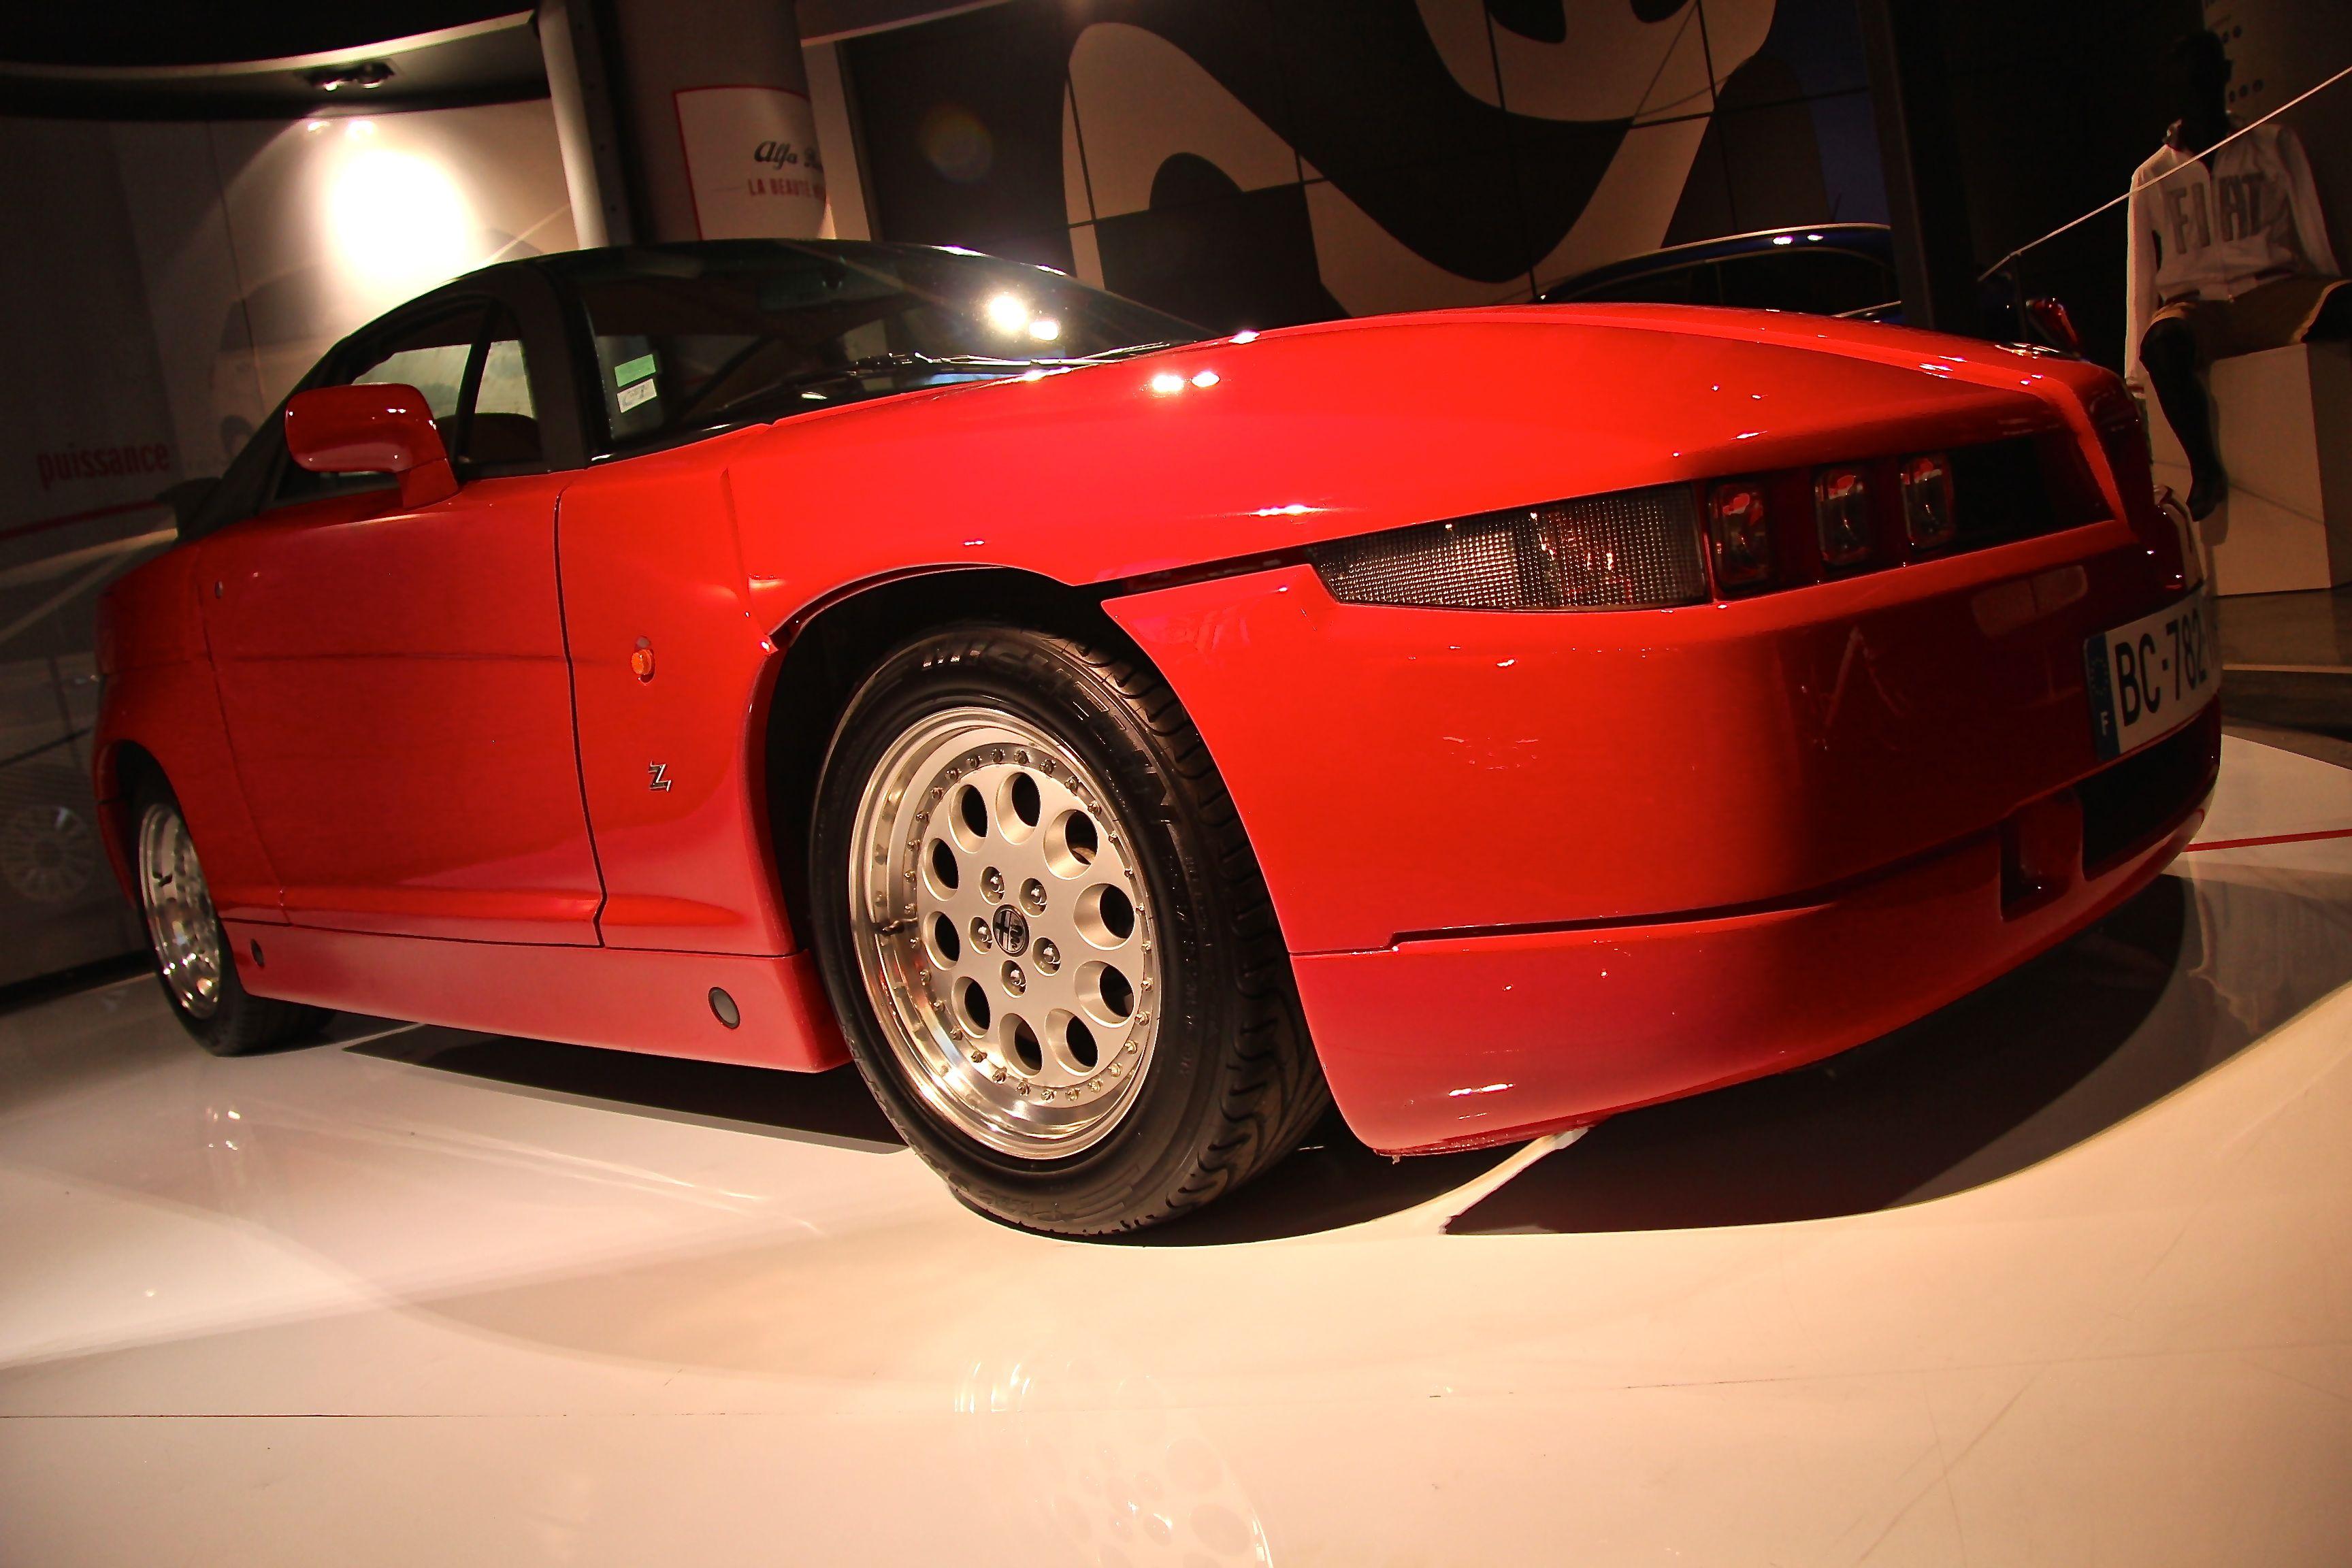 Alfa Romeo - SZ - MotorVillage - Alfa Romeo : la beauté nécessaire - 2015 - Photographie Ludo